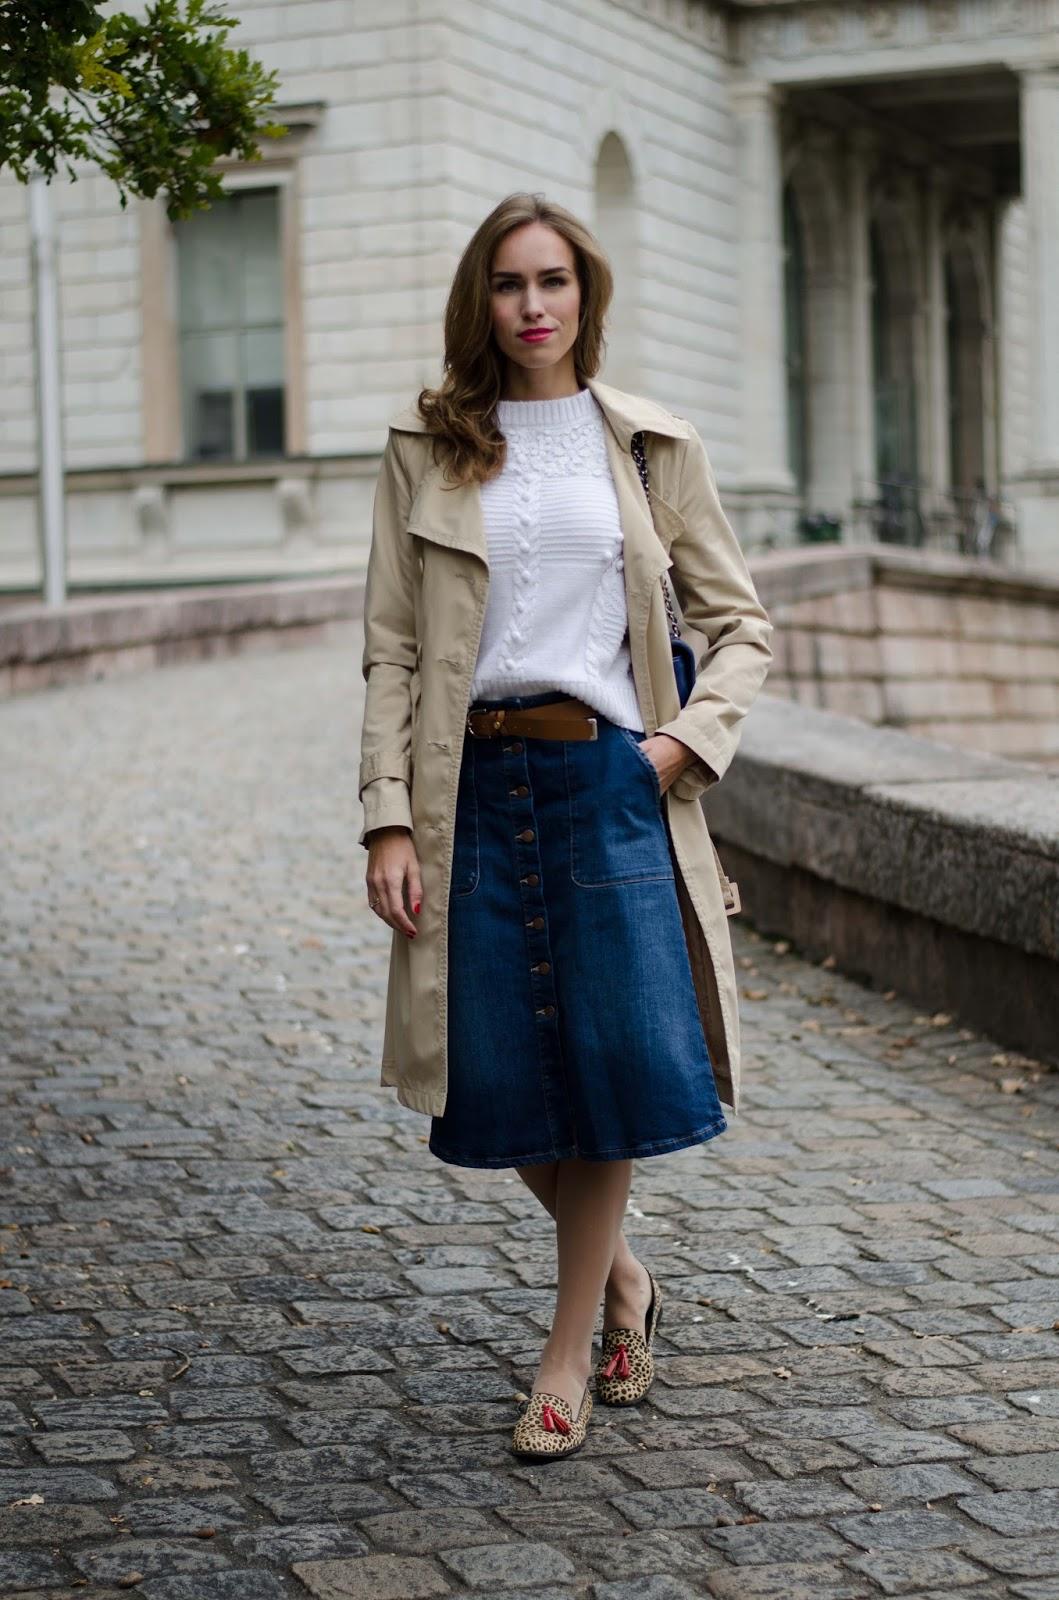 kristjaana mere beige trench white sweater blue denim lindex skirt brown belt outfit